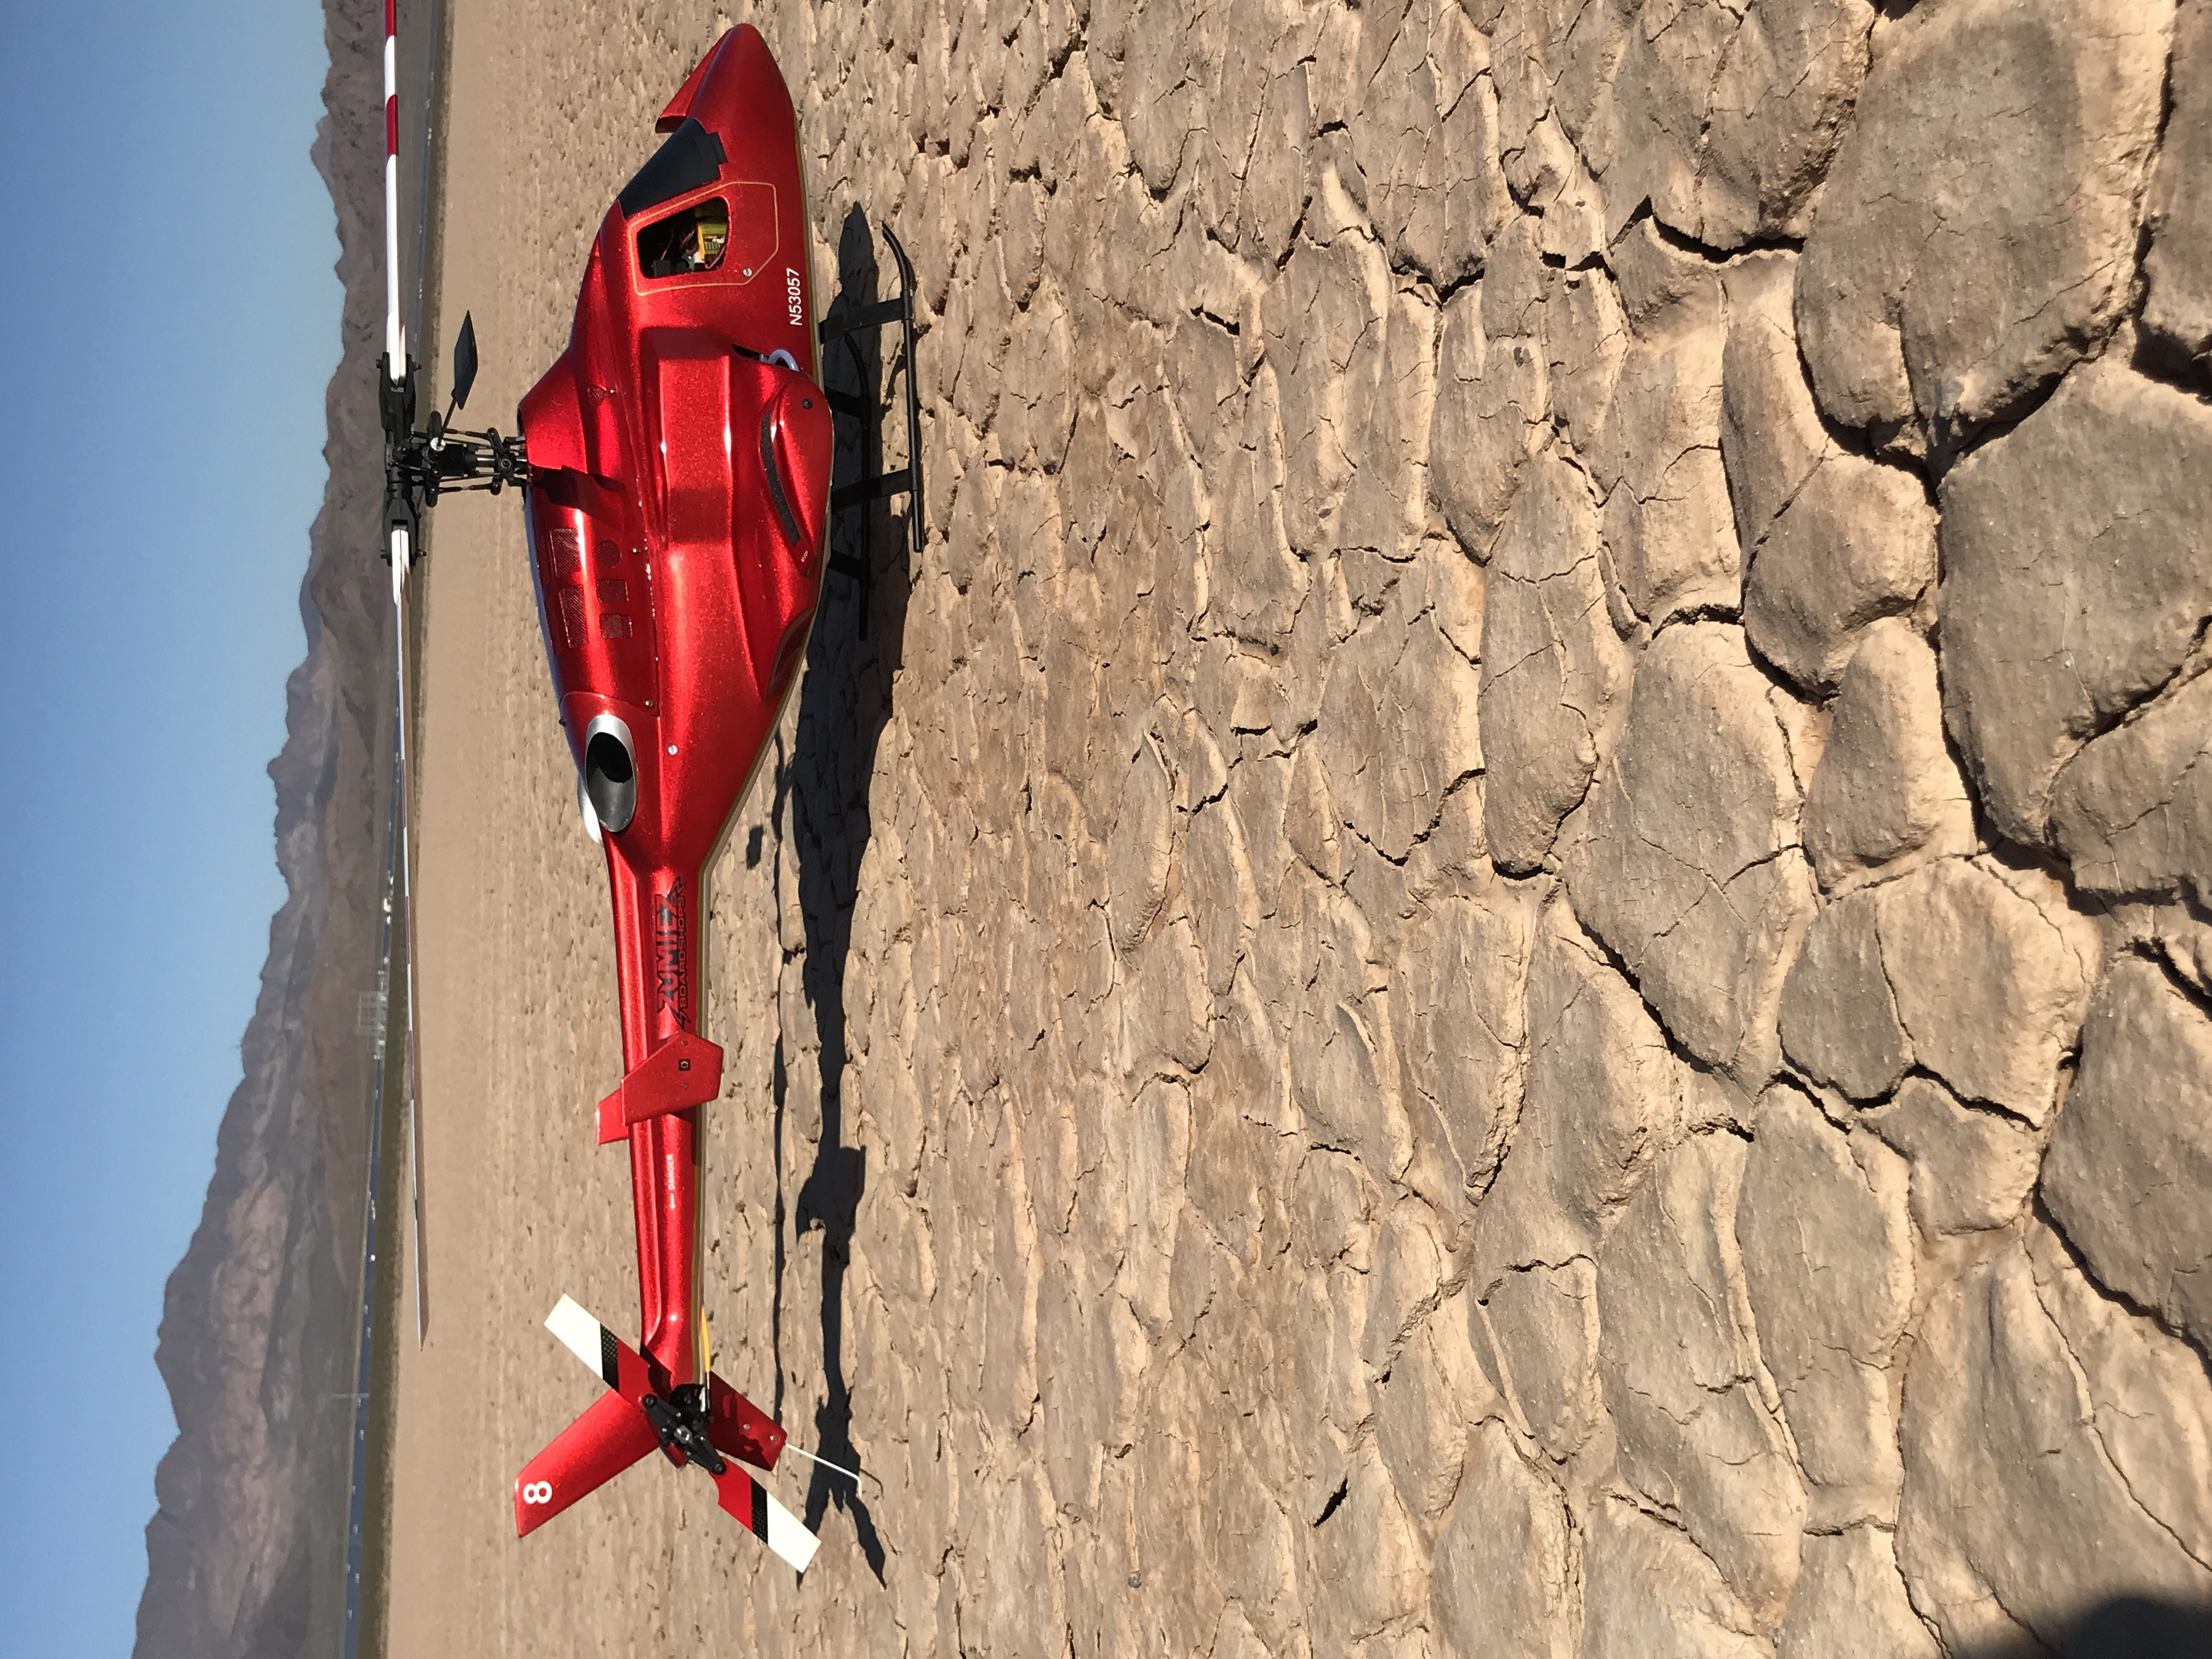 Hawk 30 Nitro in Bell 222 body - Candy Apple Red